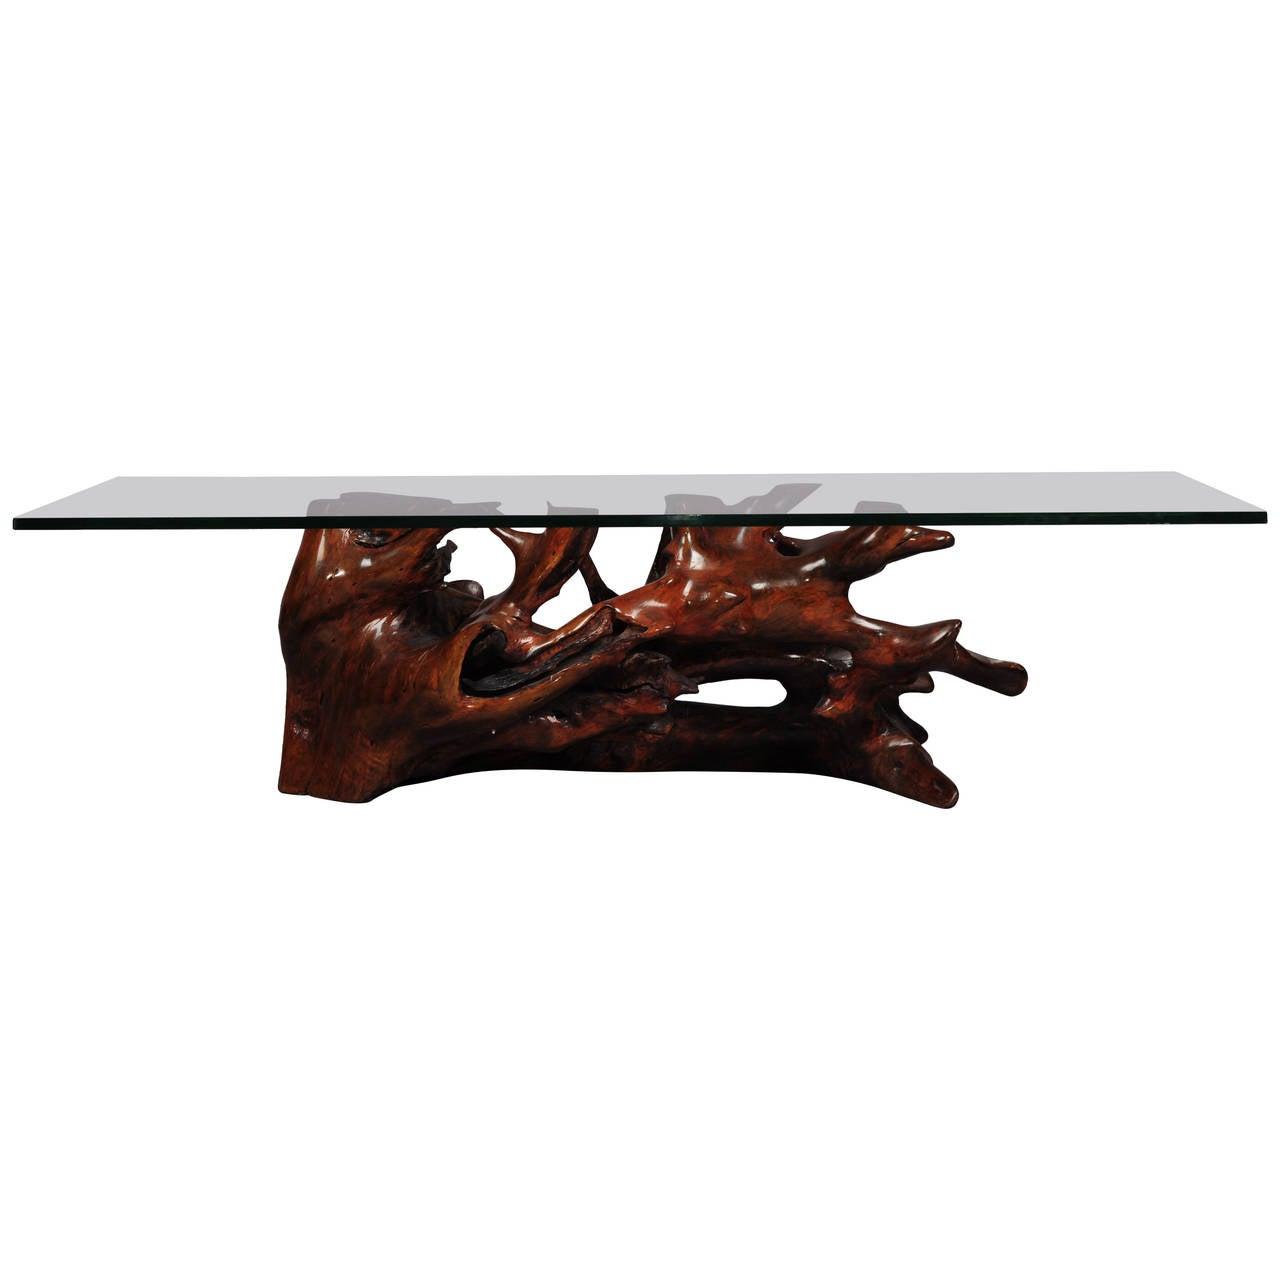 Big Wood And Glass Coffee Table At 1stdibs